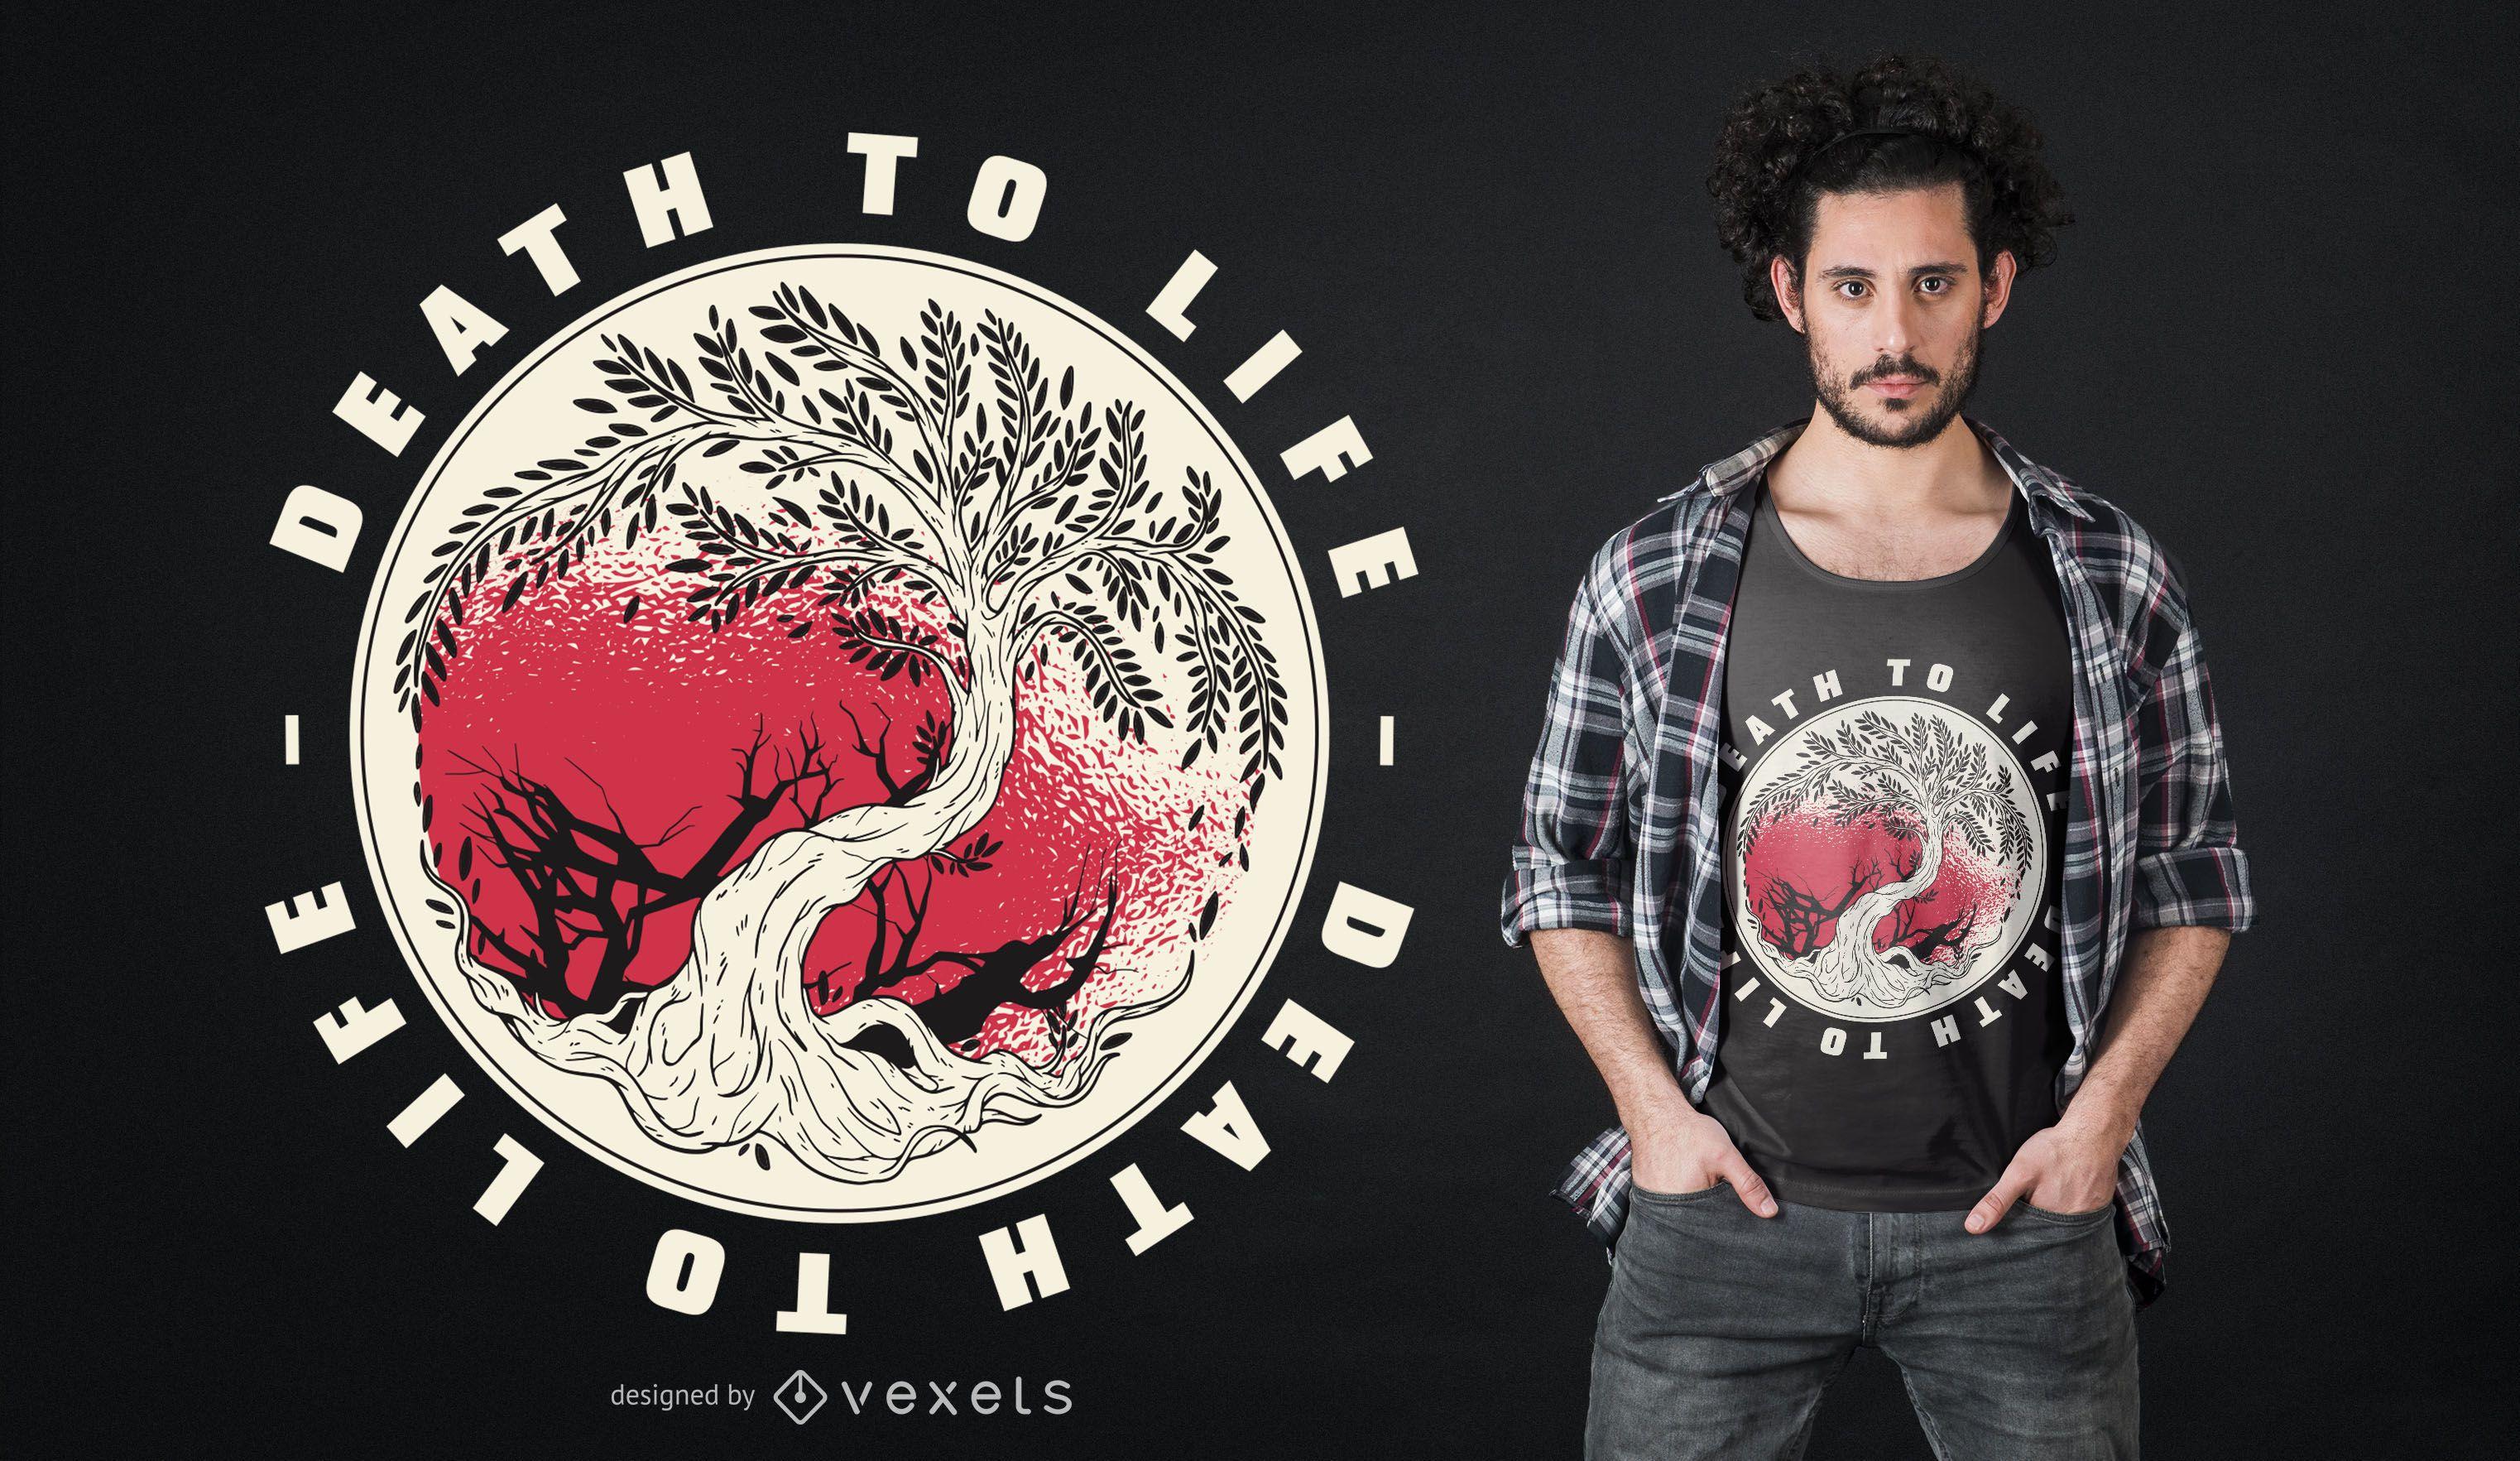 Death to life t-shirt design